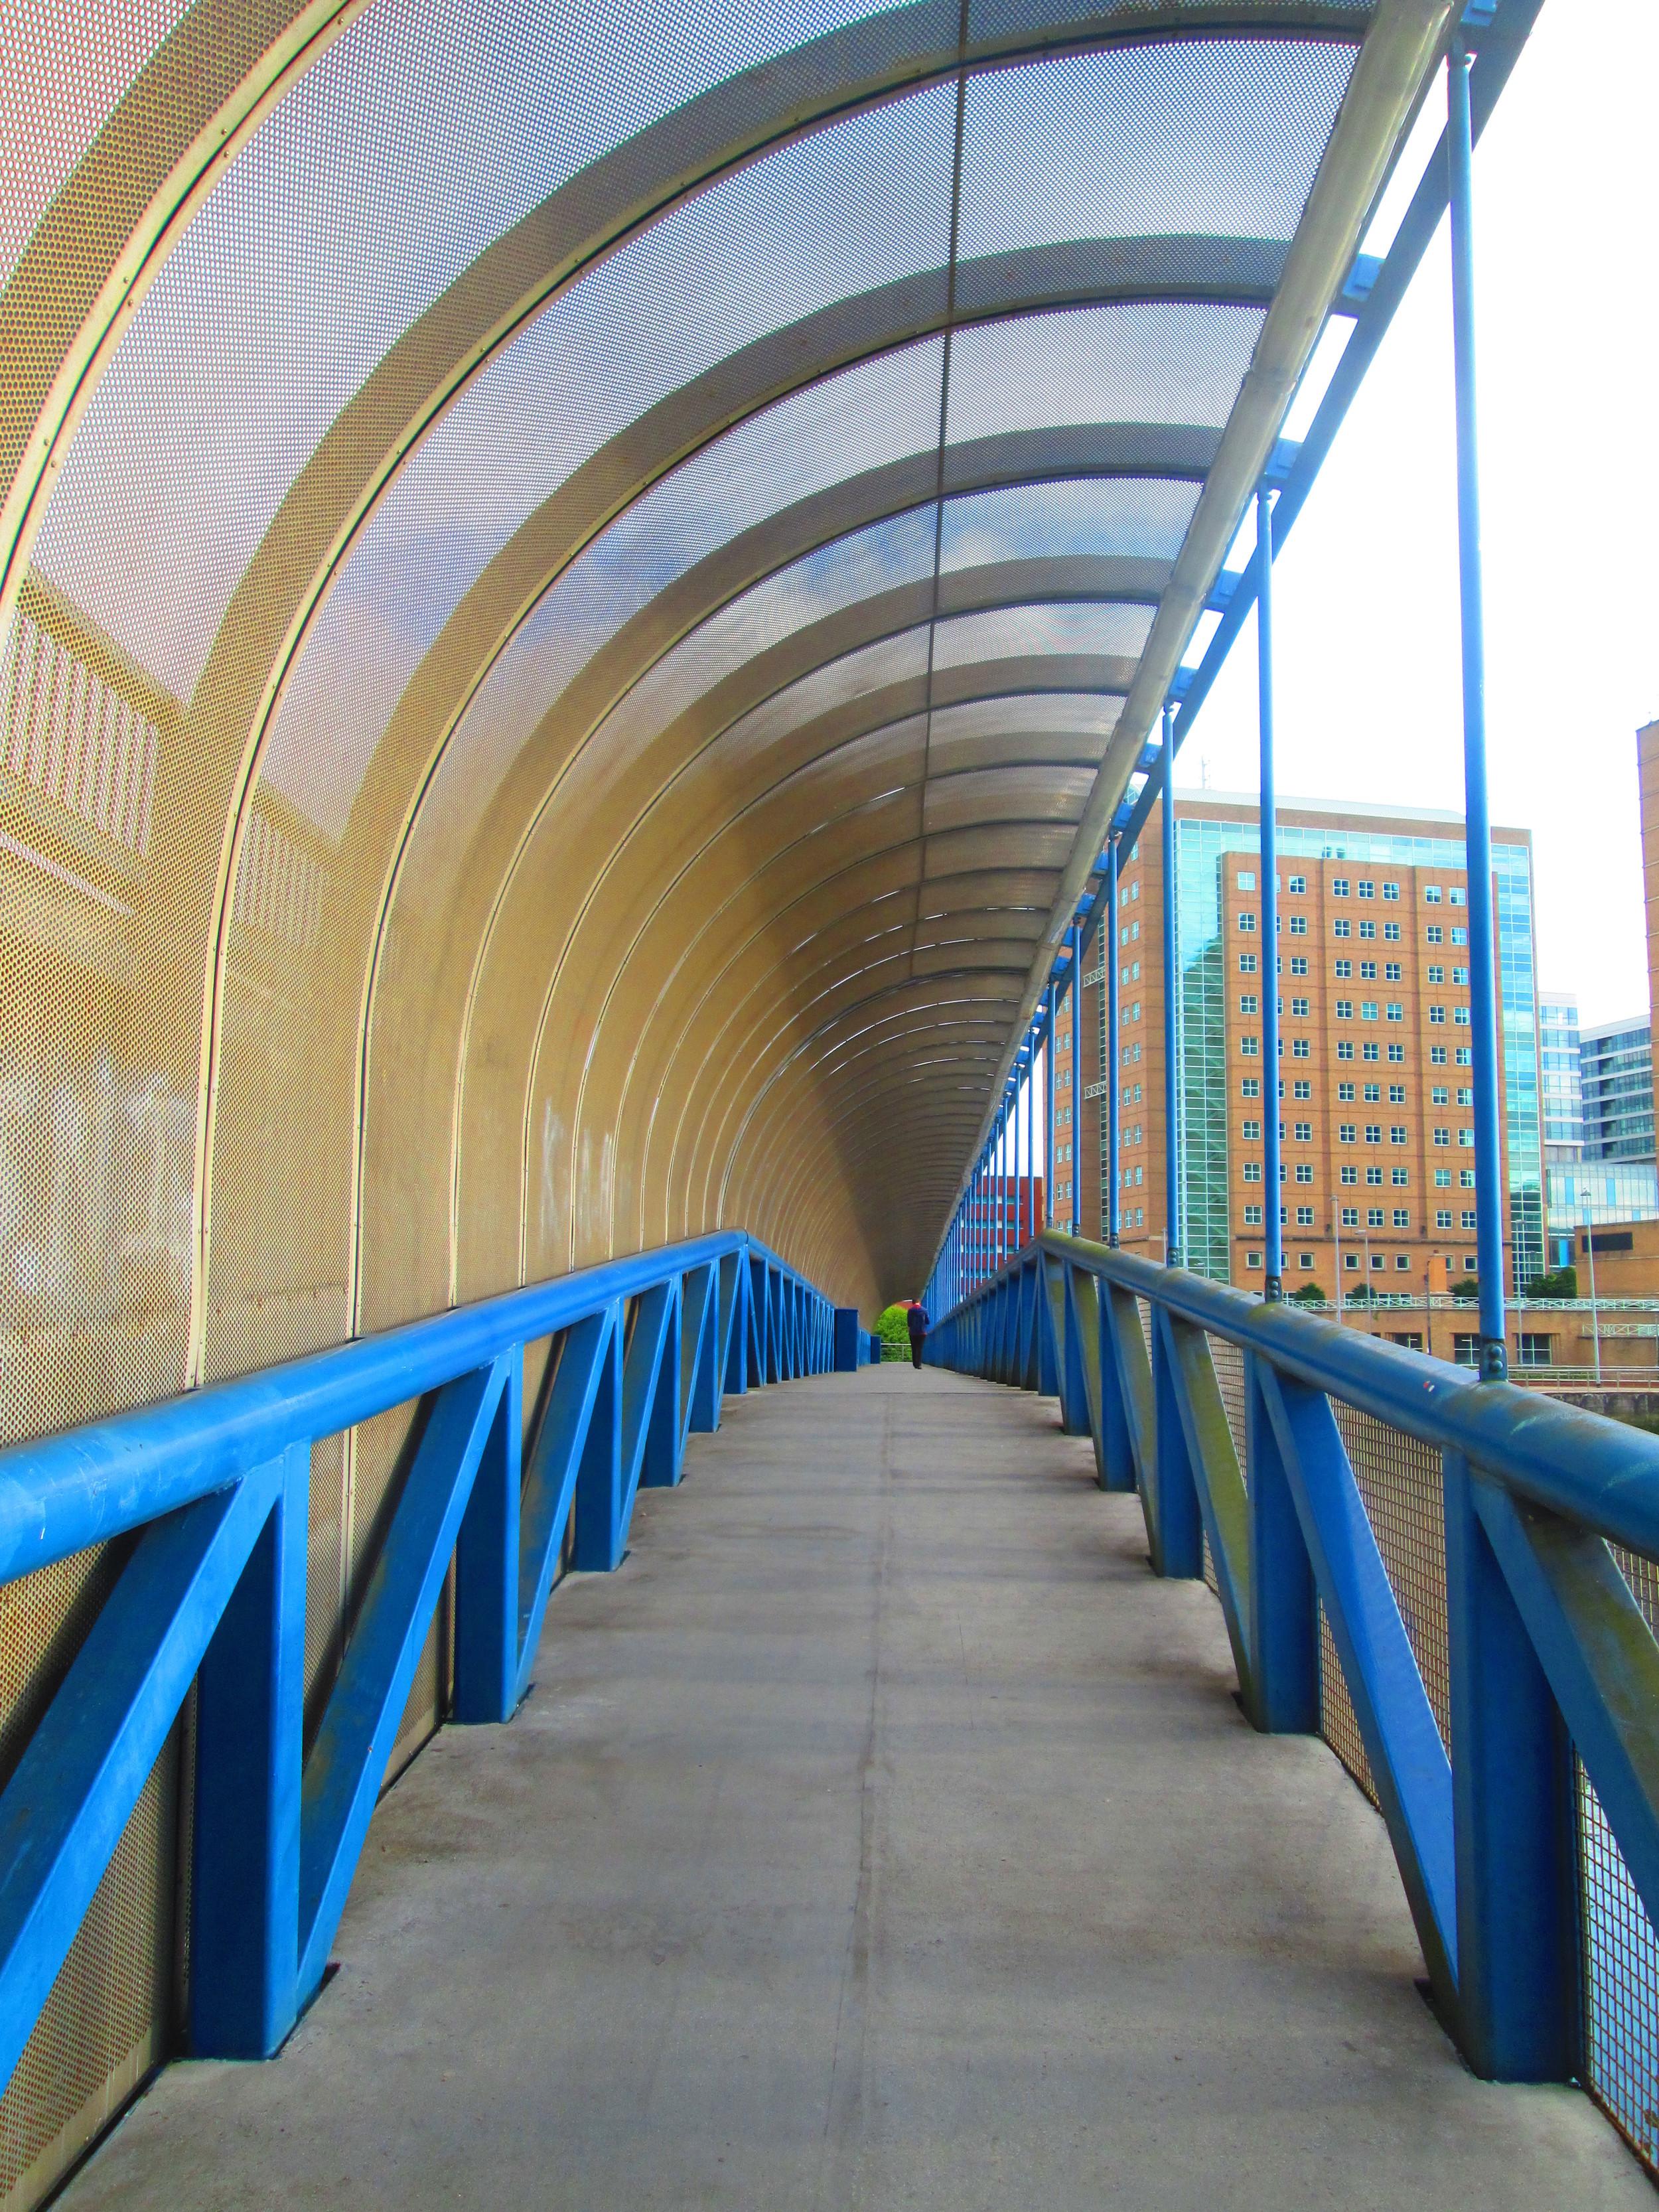 My Favourite Bridge #Belfast